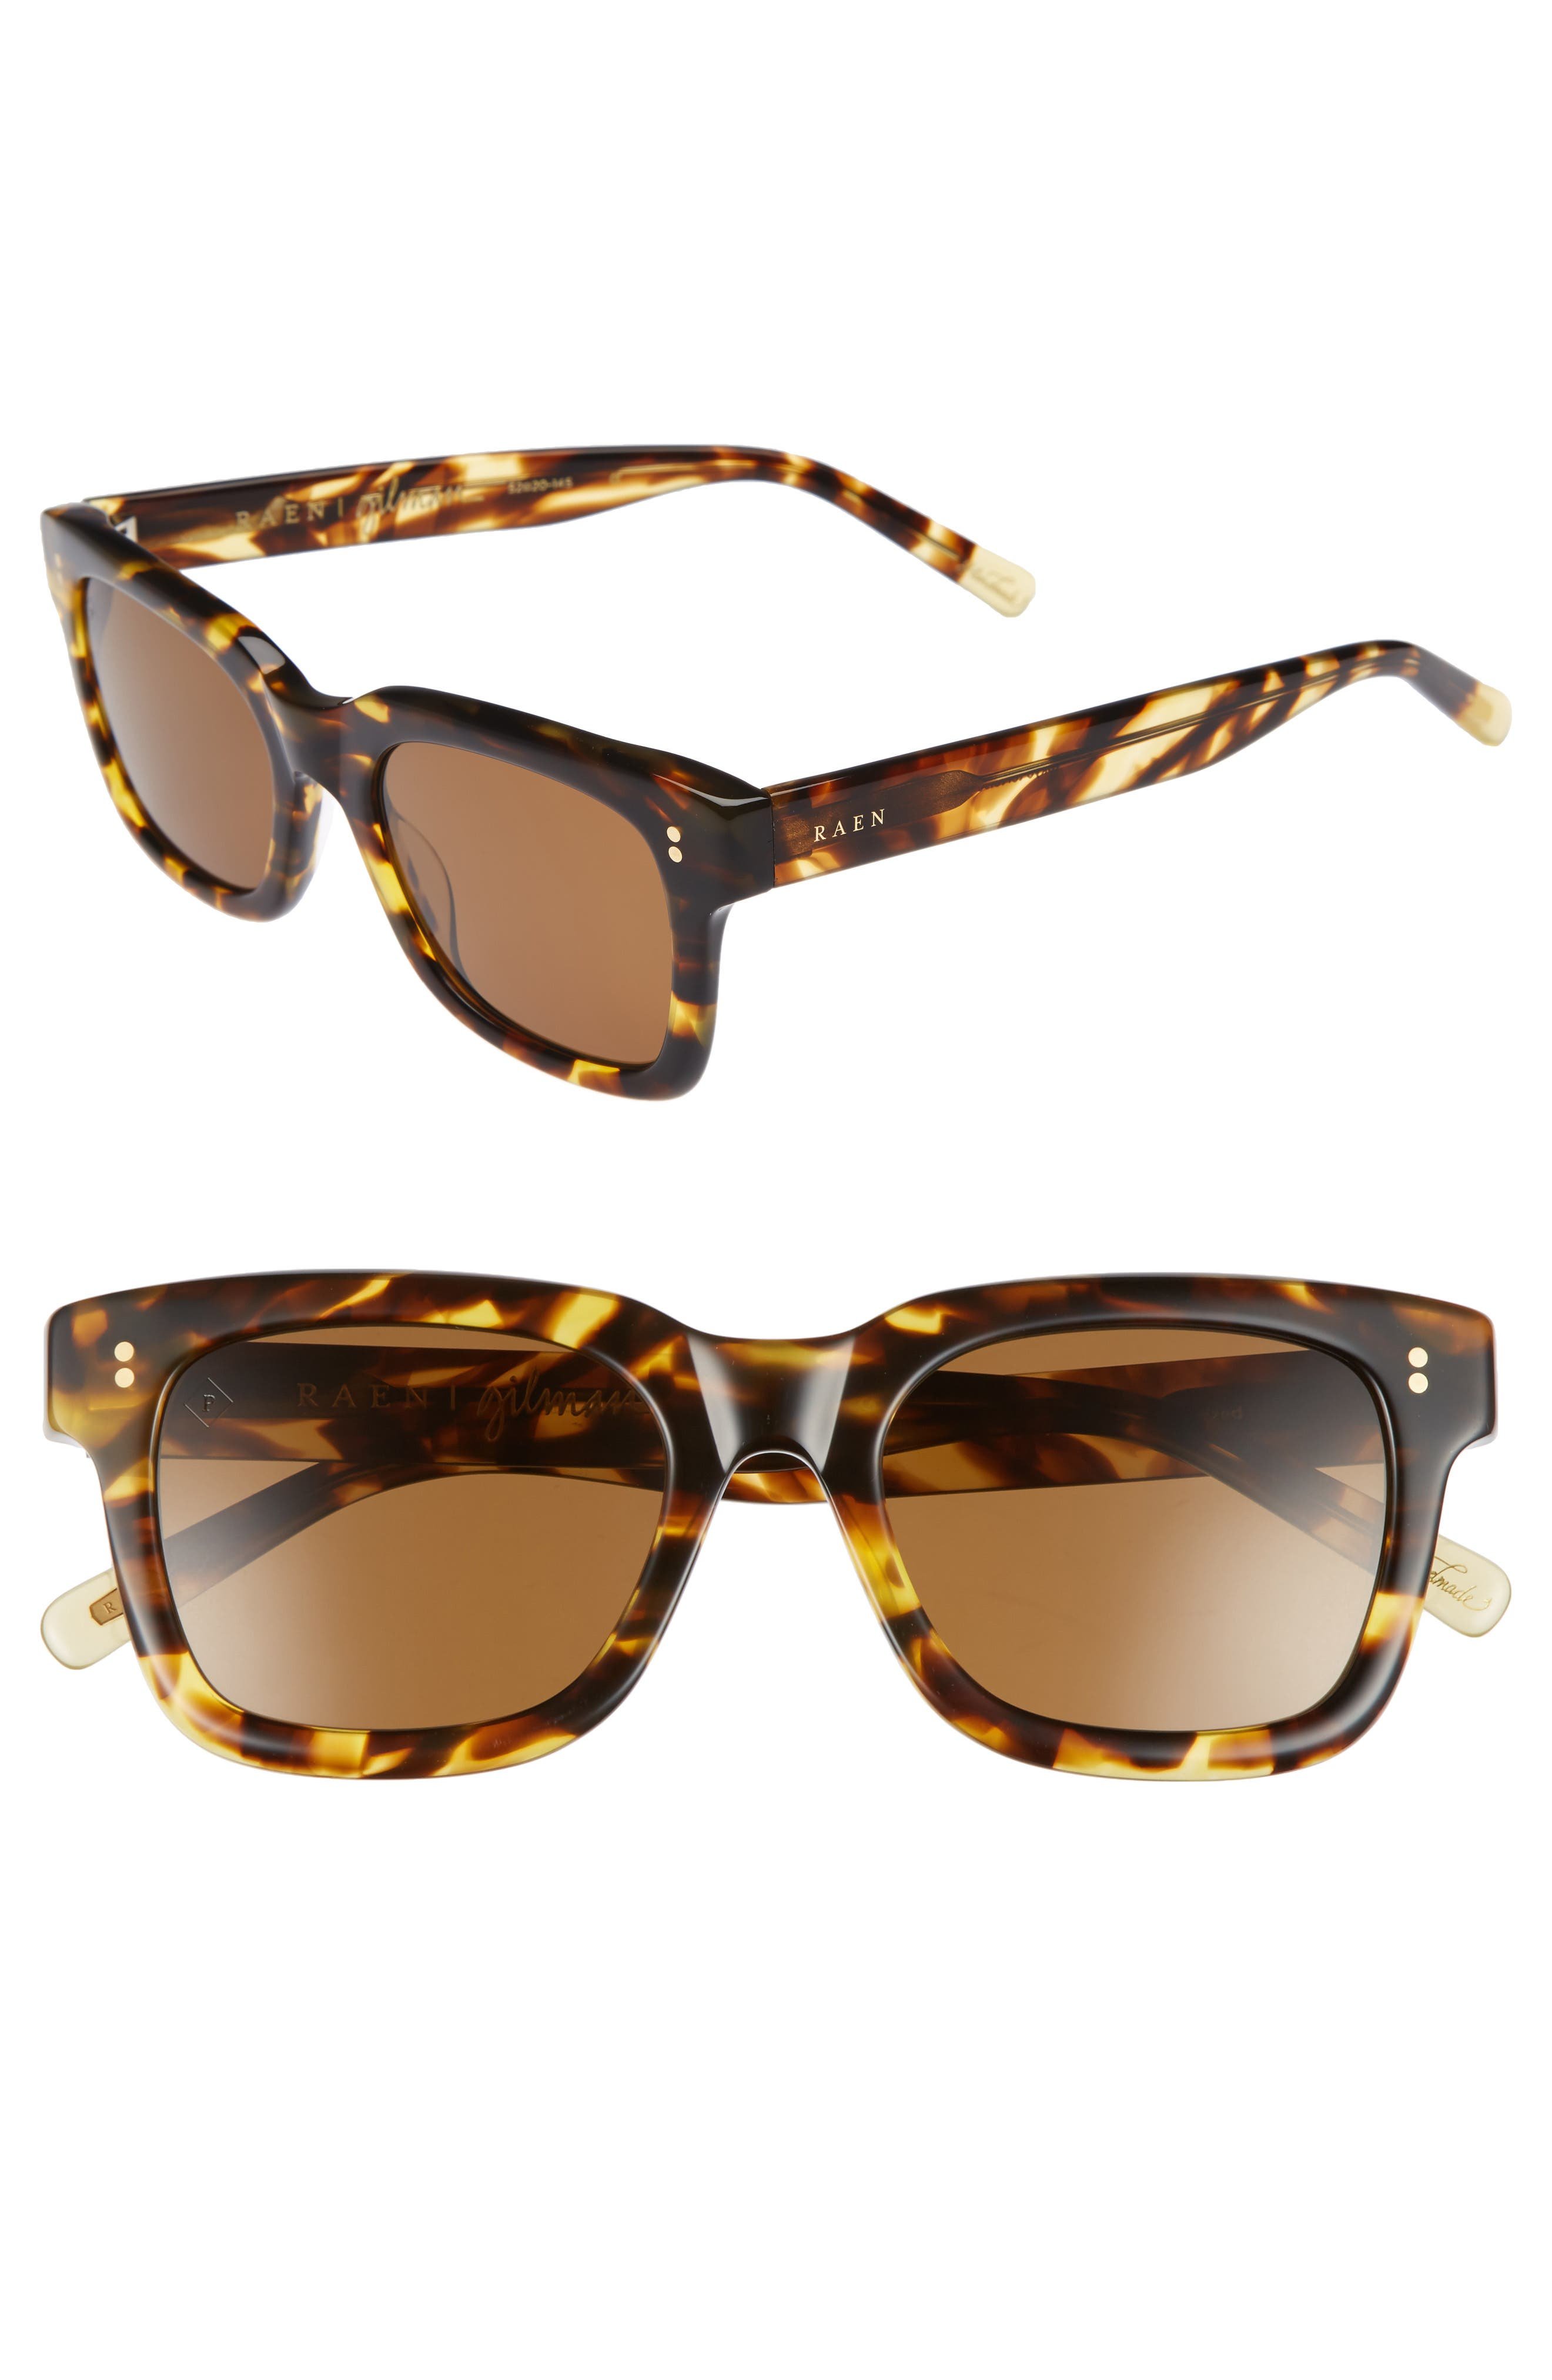 Gilman 52mm Polarized Sunglasses,                             Main thumbnail 1, color,                             TOKYO TORTOISE/ BROWN